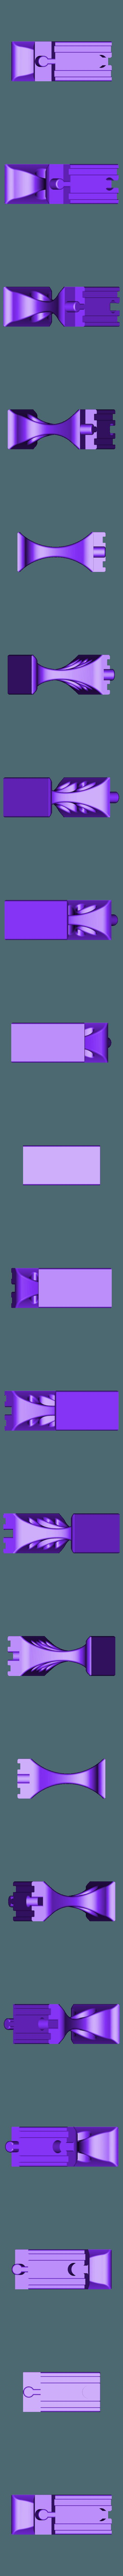 Bridge Support Track.stl Download free STL file Toy Train Tracks • 3D printer design, FerryTeacher